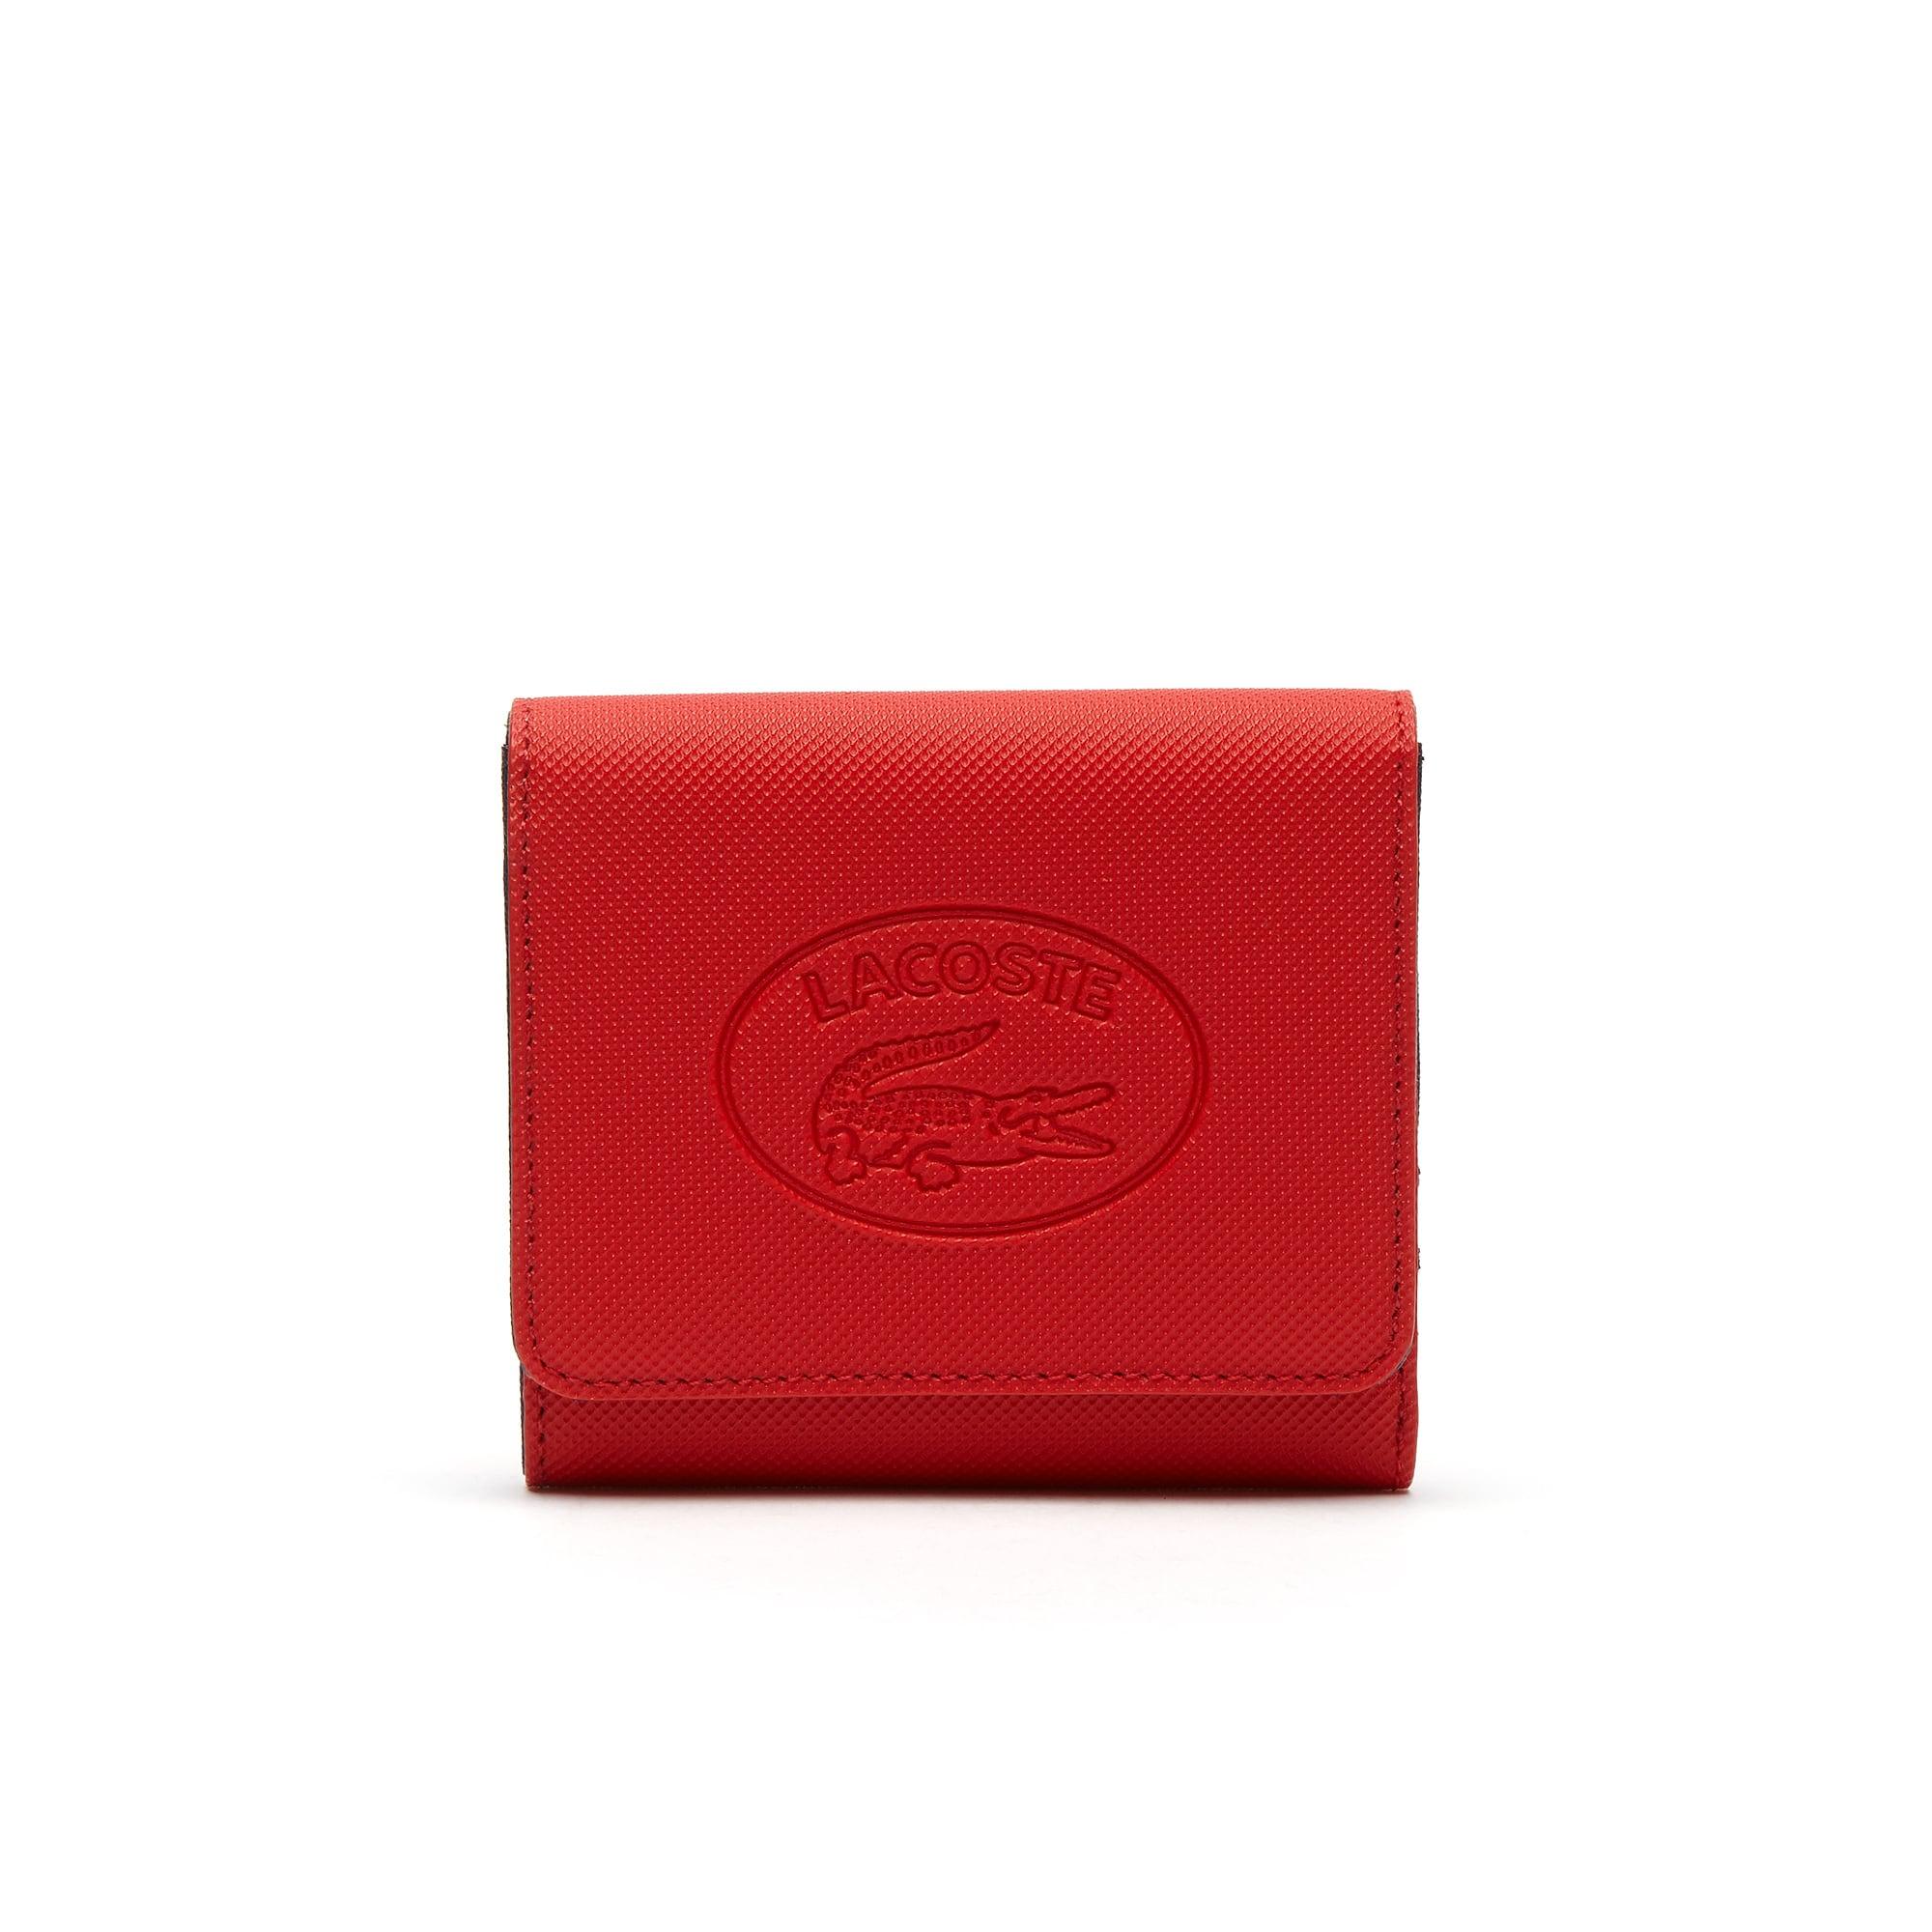 Damen Classic Colorblock 6 Karten-Brieftasche aus Piqué-Canvas